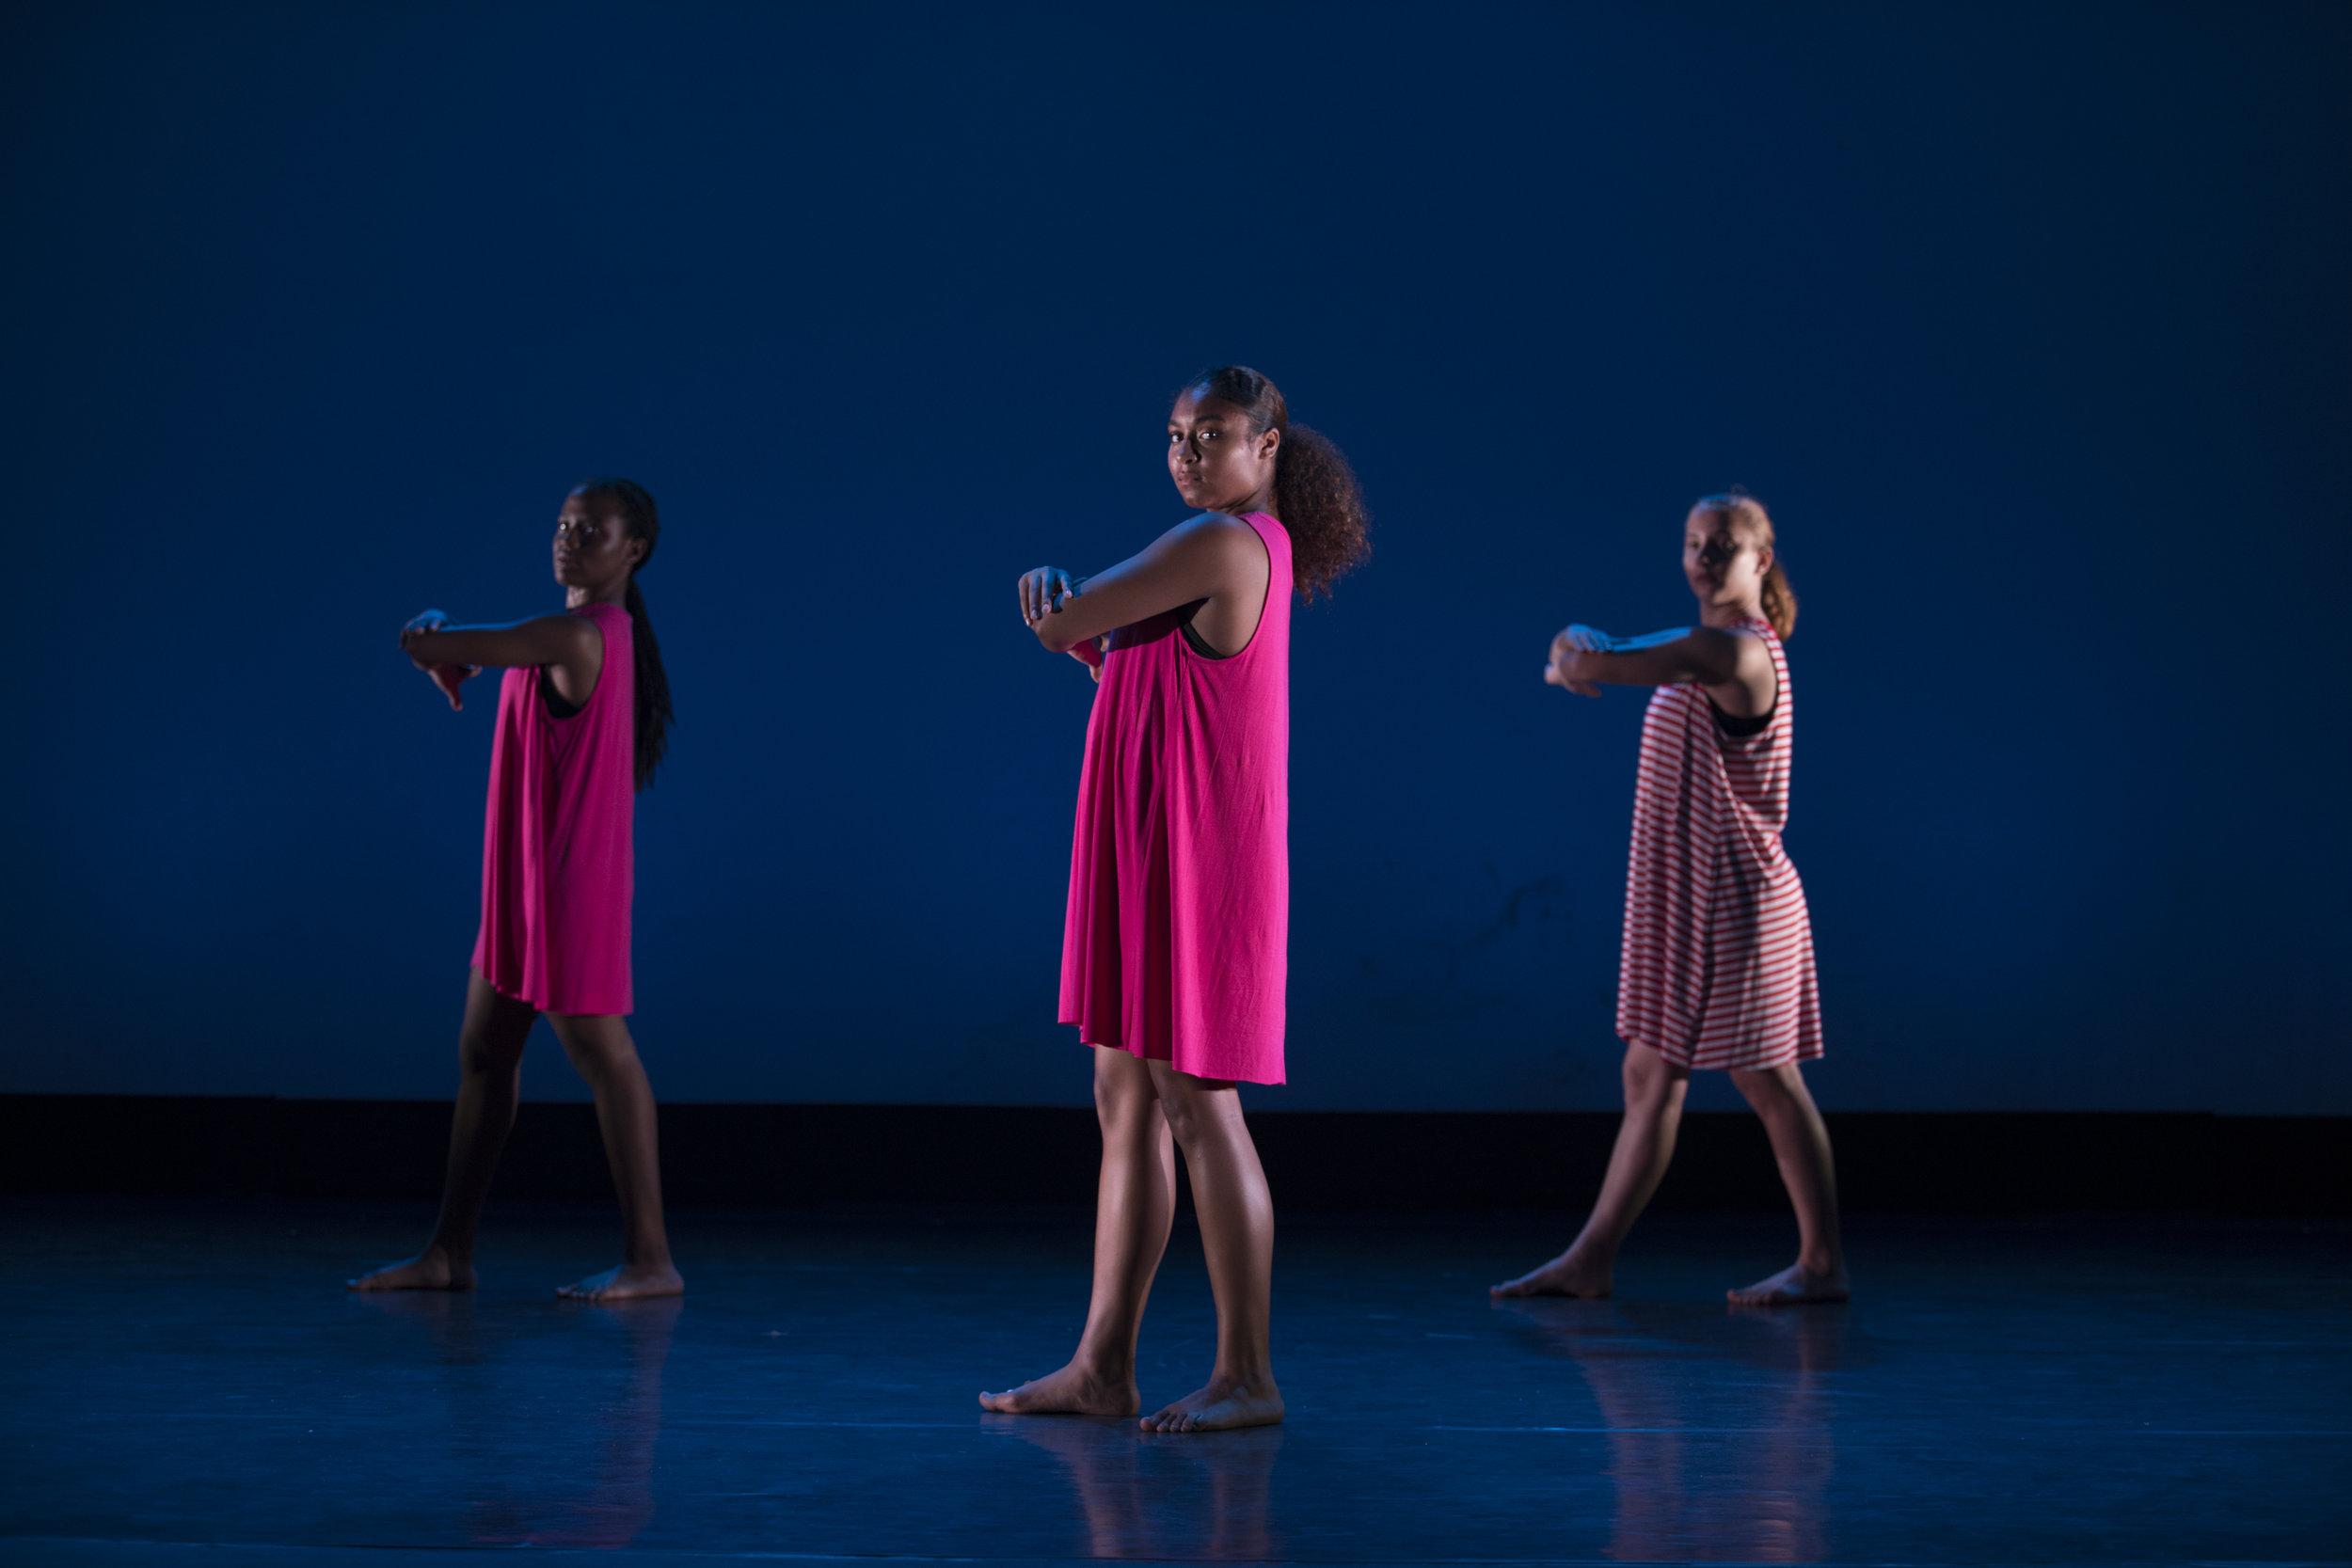 Dance Show by Jehanne-Marie Milne-57.jpg